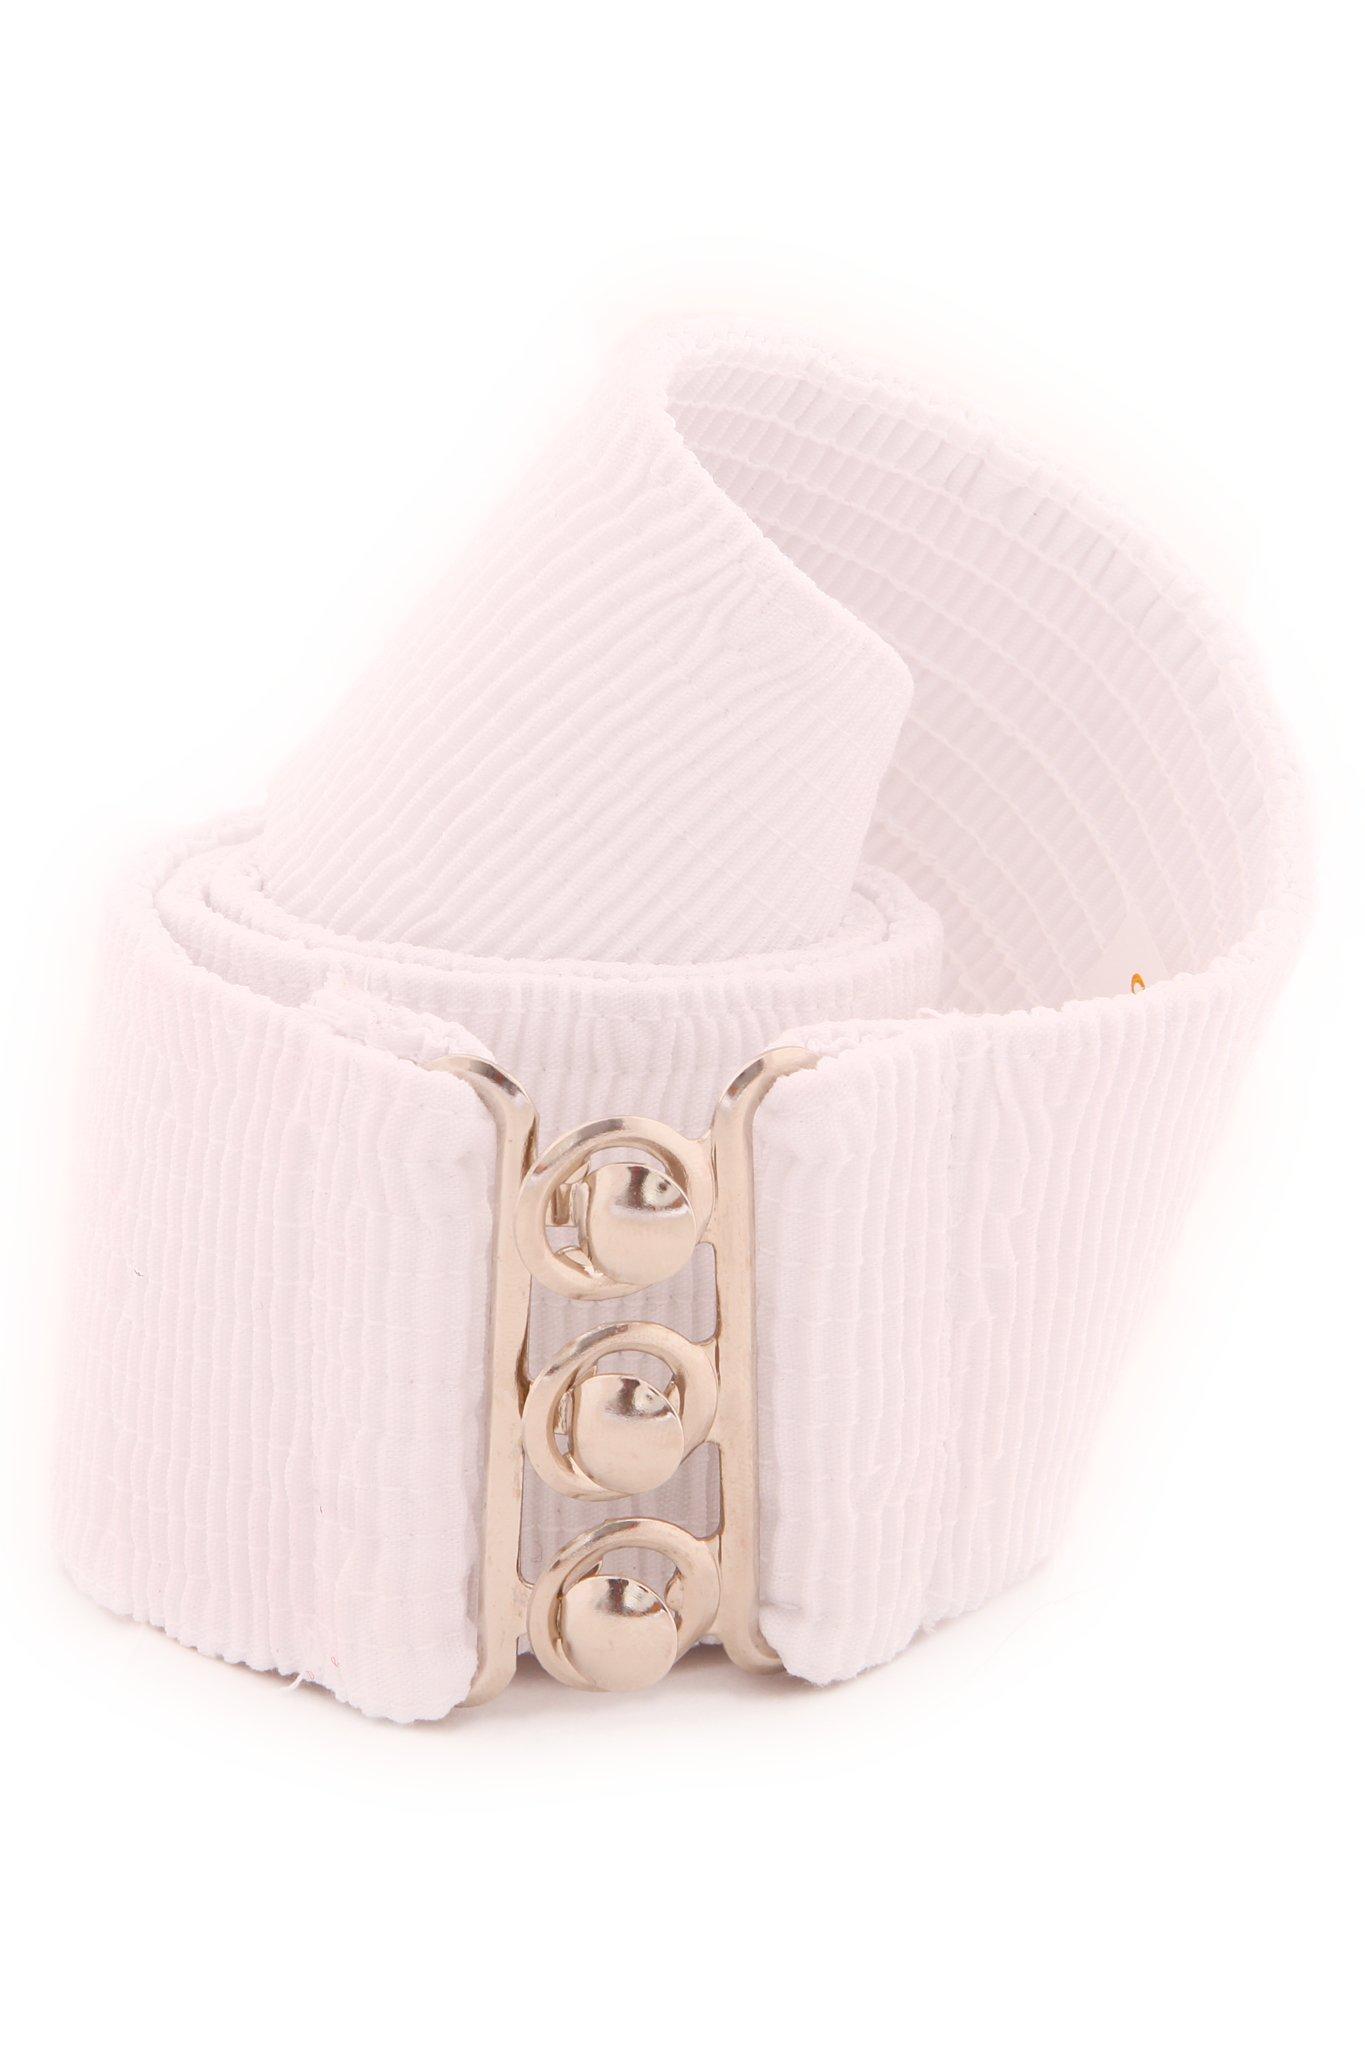 Malco Modes Wide Elastic Cinch Waist Belt Stretch Belt for Women, Plus Sizes Small White